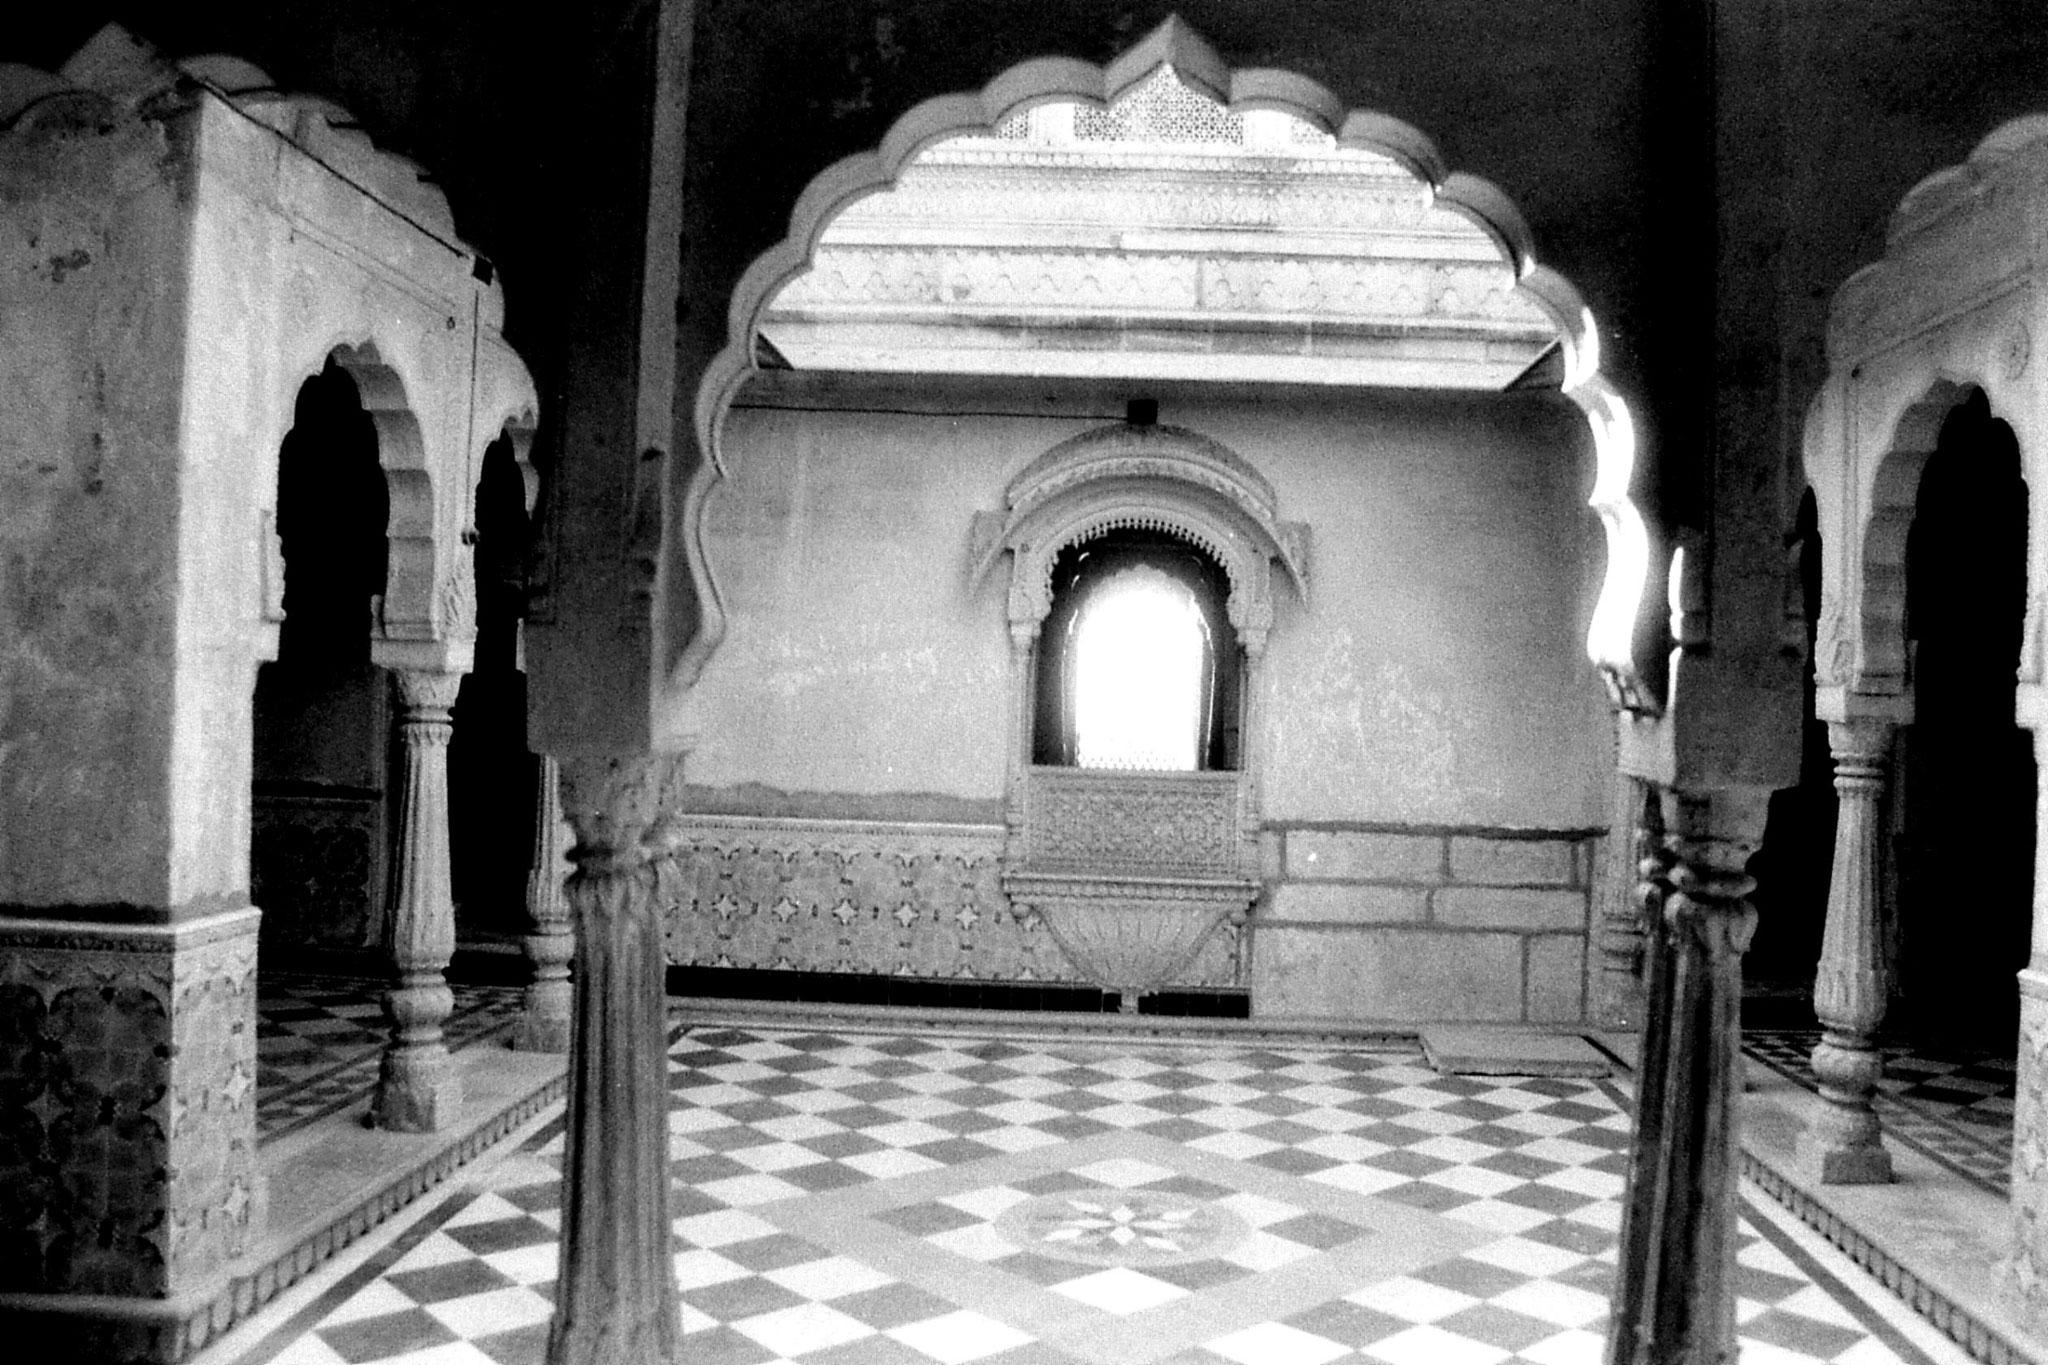 3/12/1989: 22: Jaisalmer courtyard